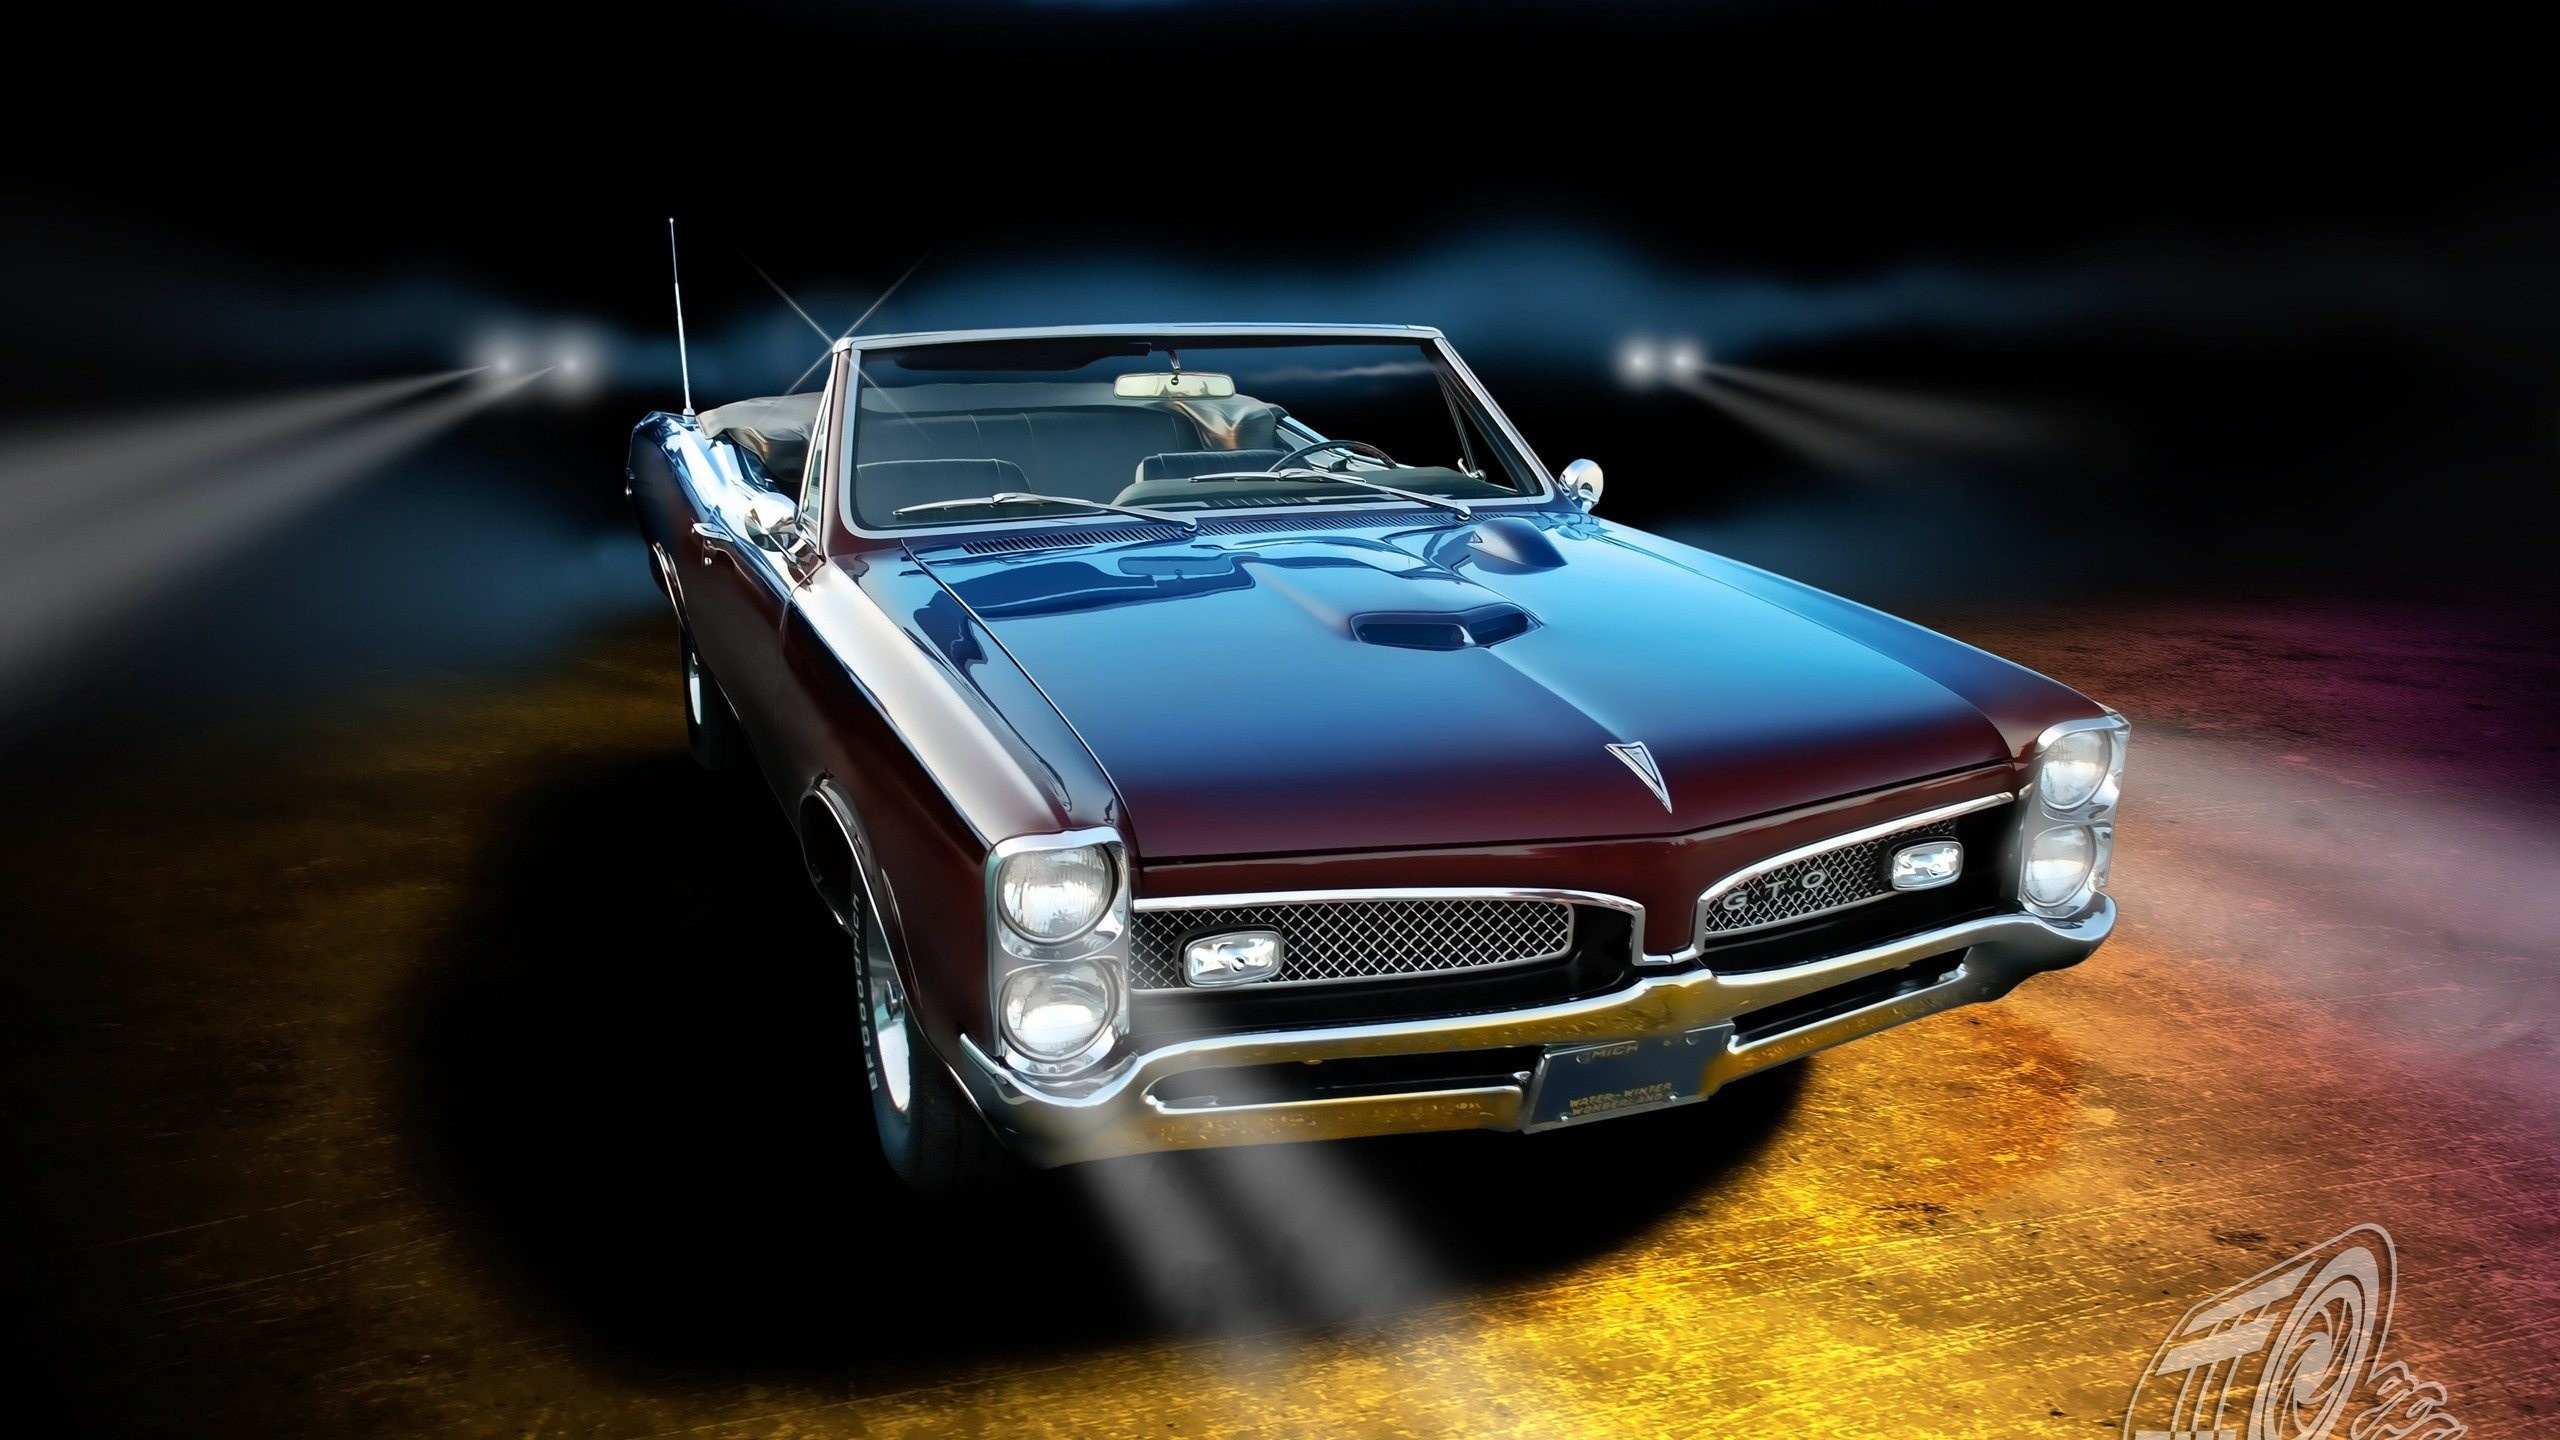 Pontiac Gto Classic Muscle Cars Wallpaper